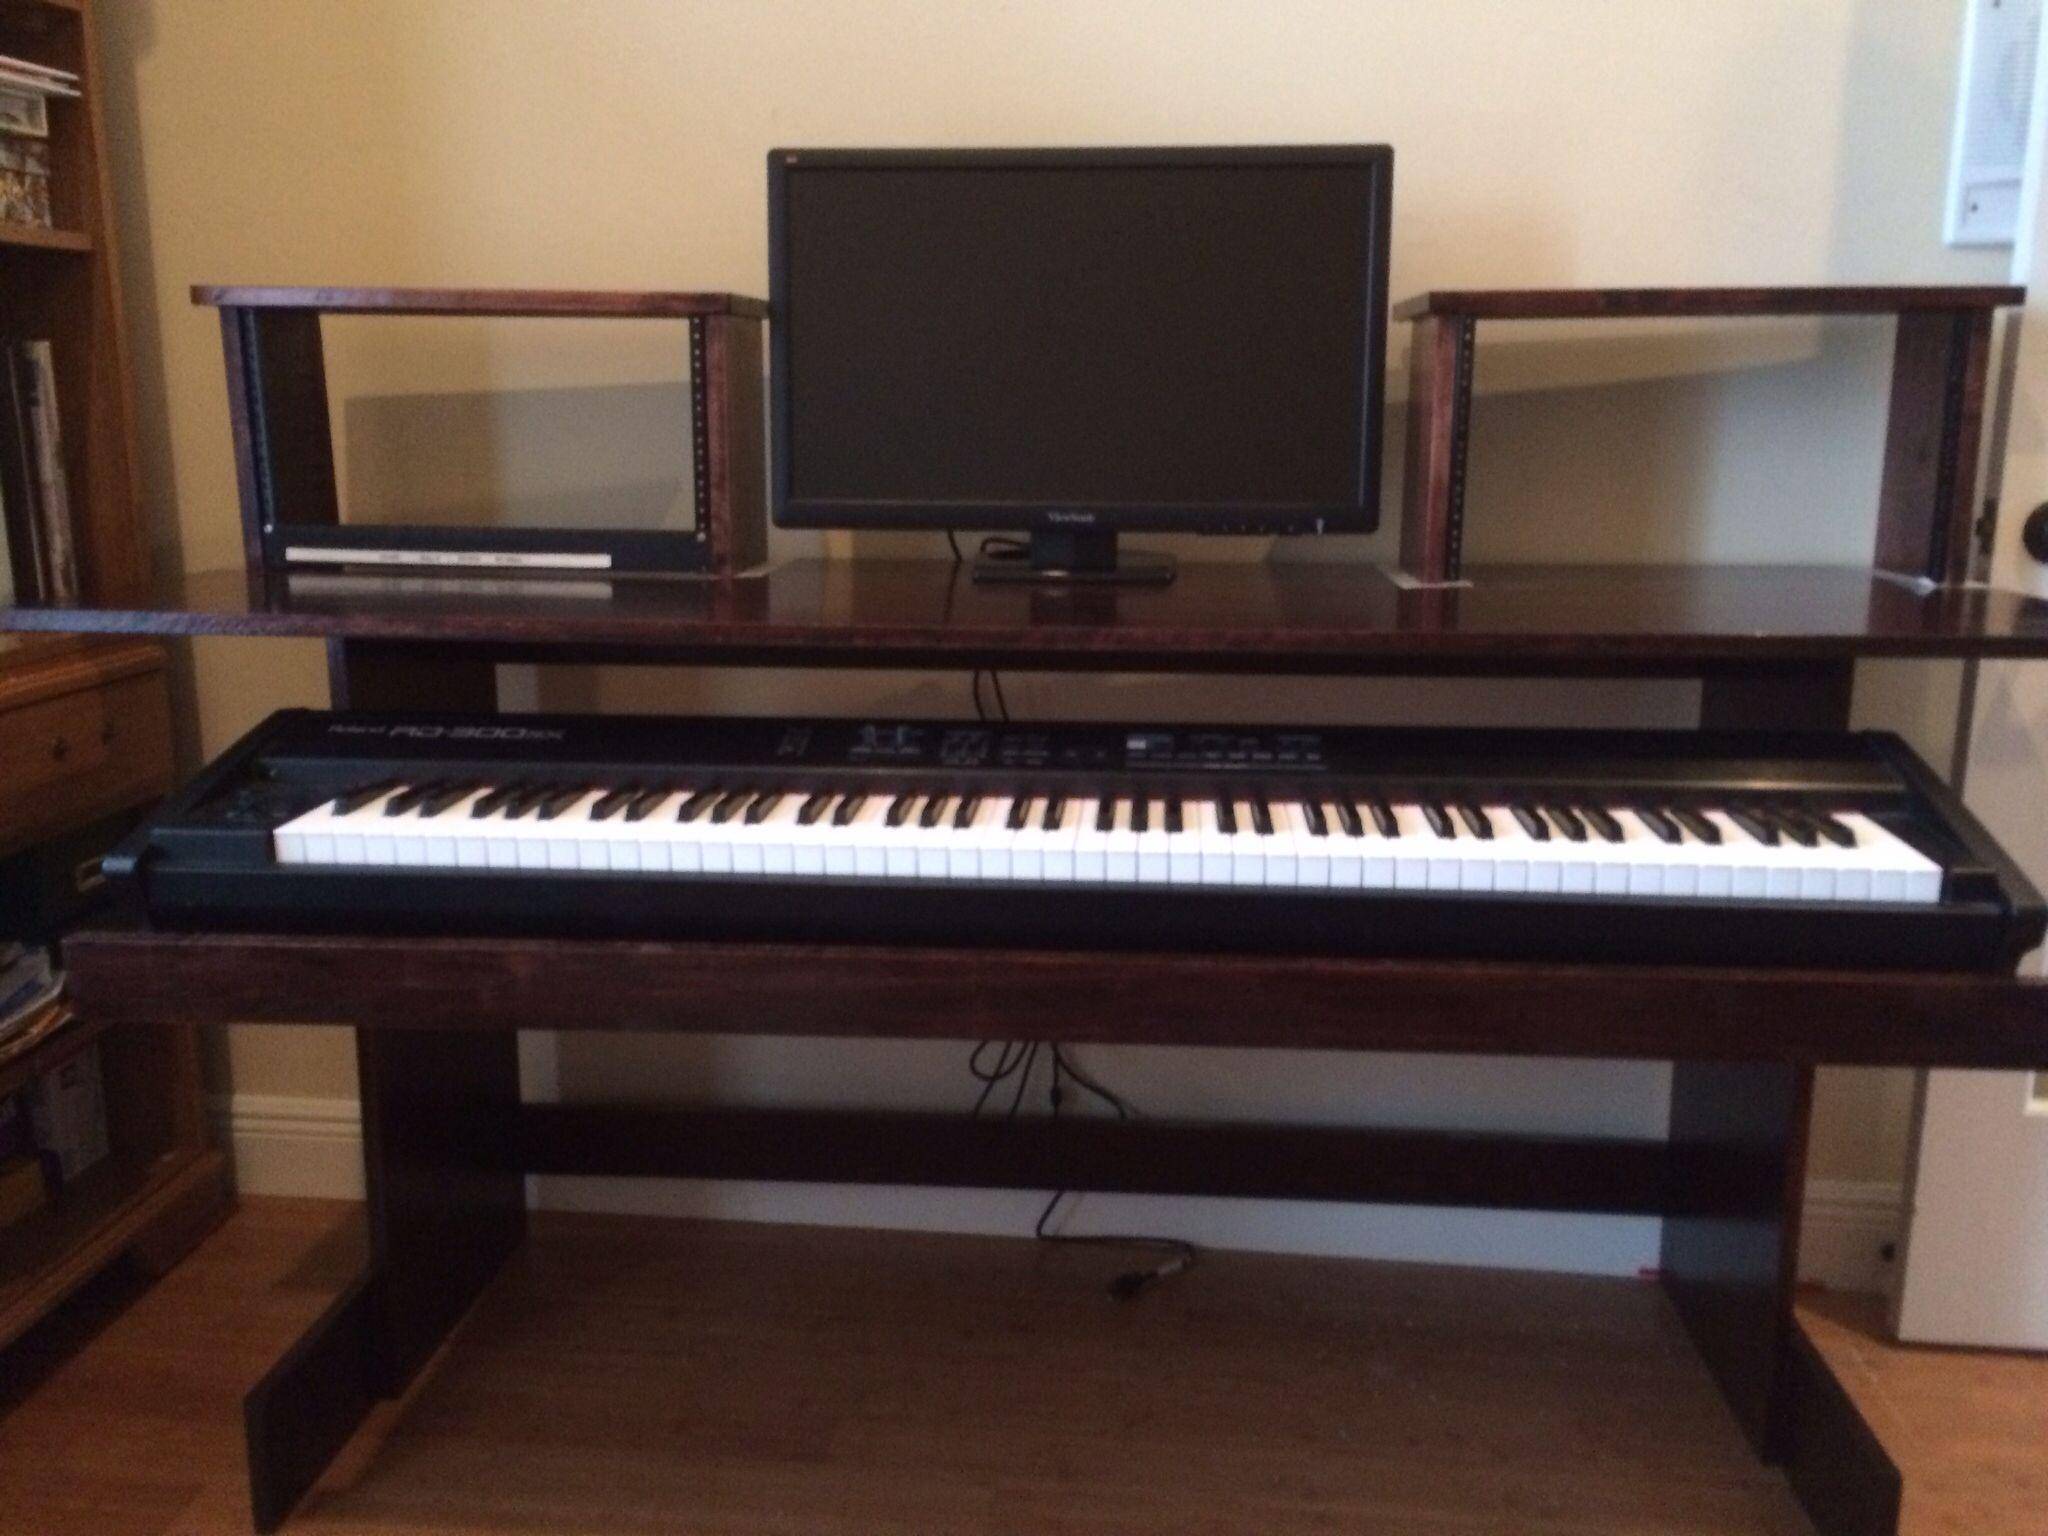 New Desk I Built For Home The Keyboard Drawer Slides All